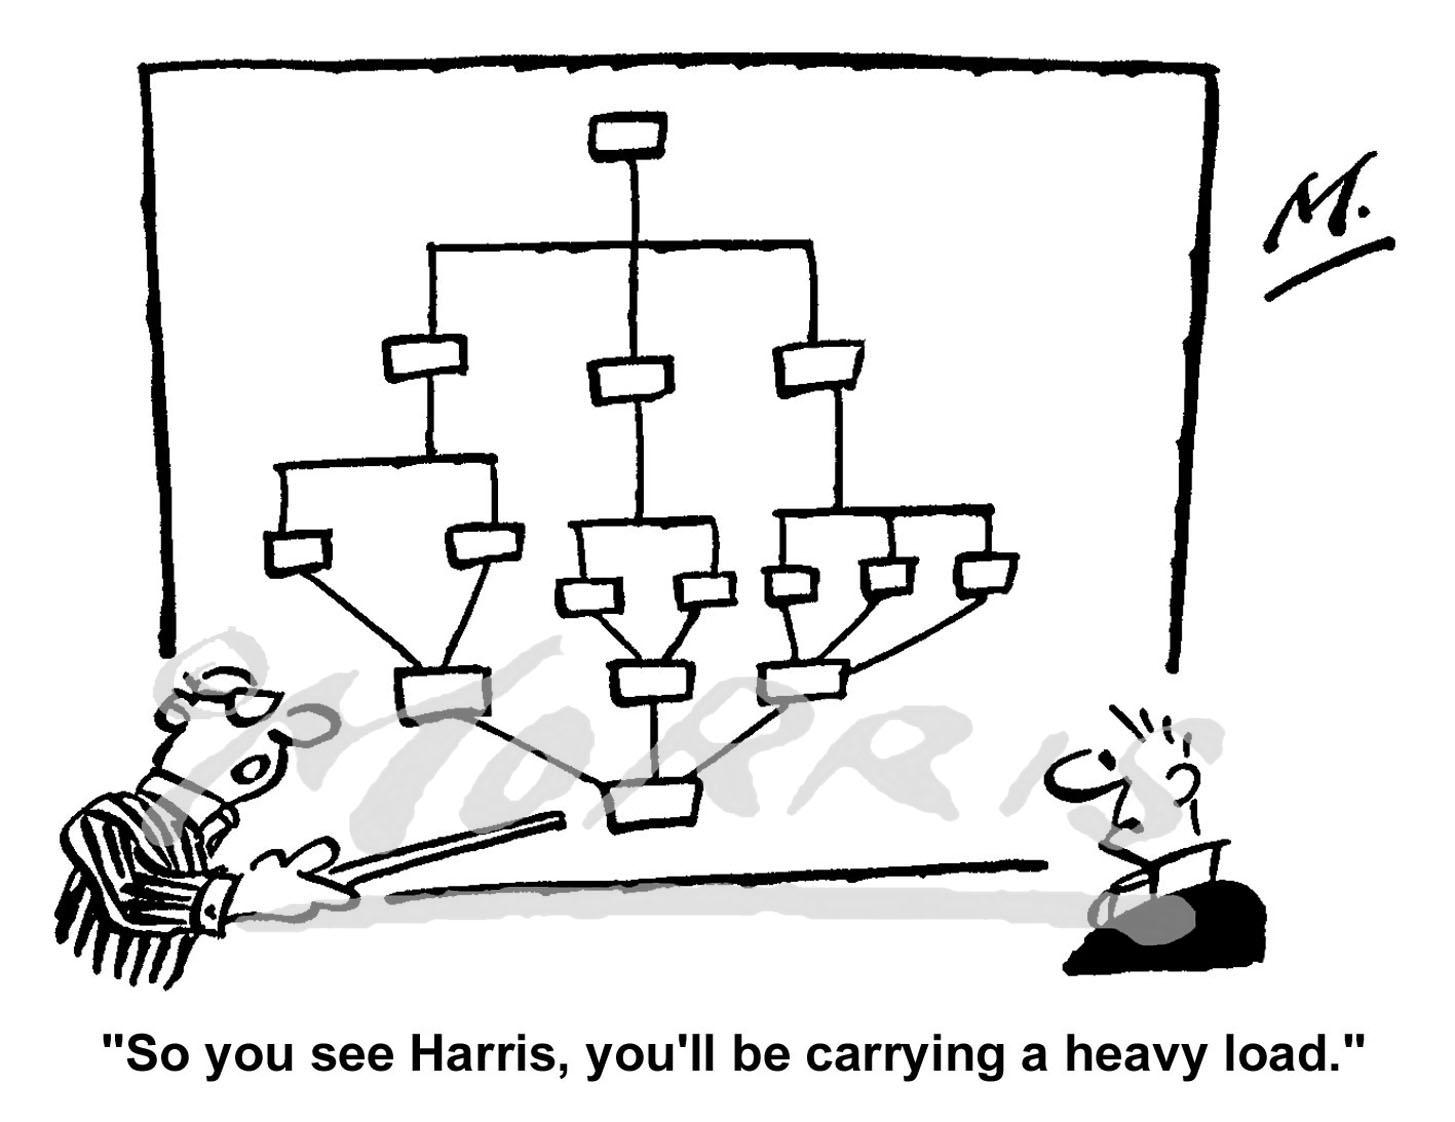 Manager employee office graph cartoon Ref: 0606bw